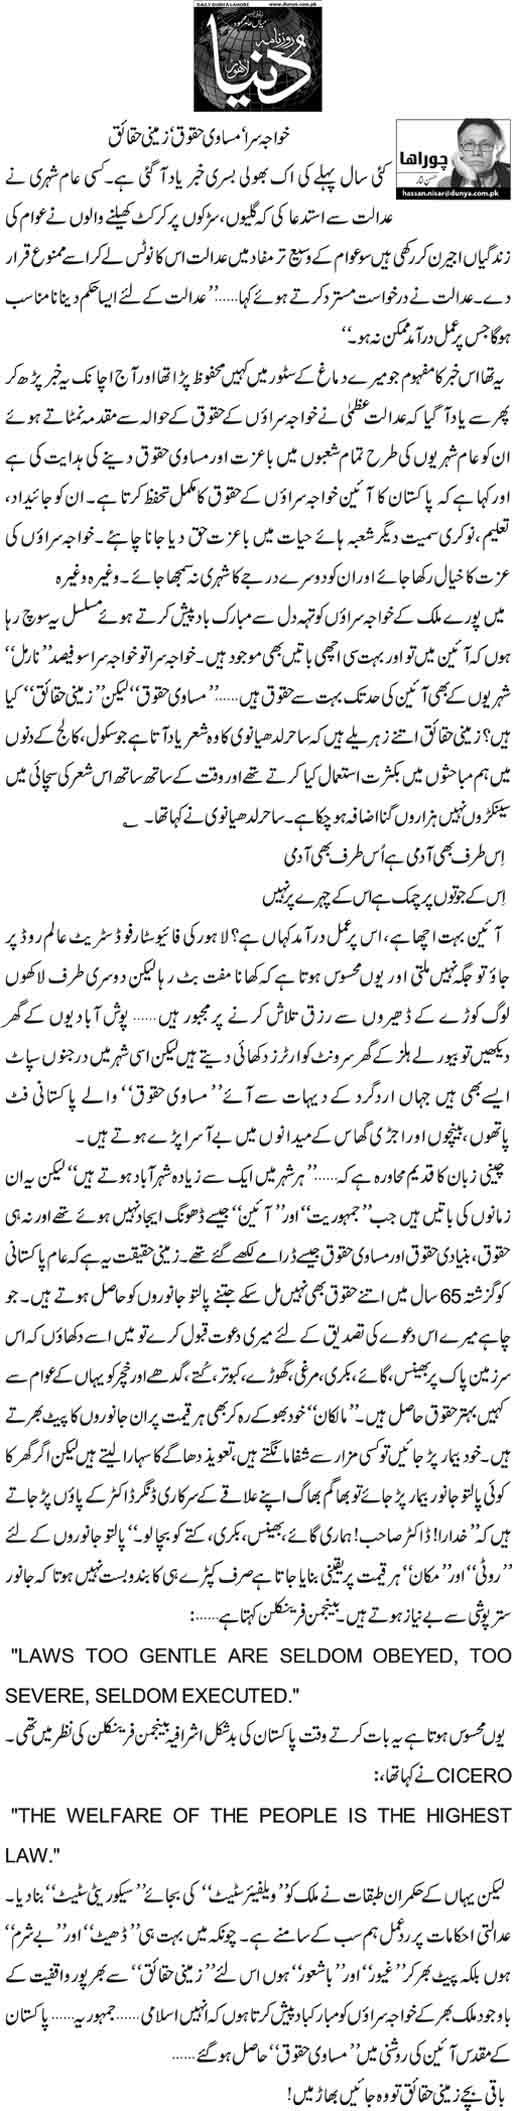 Khaja Sira, masawi huqooq, zameeni haqaiq - Hasaan Nisar